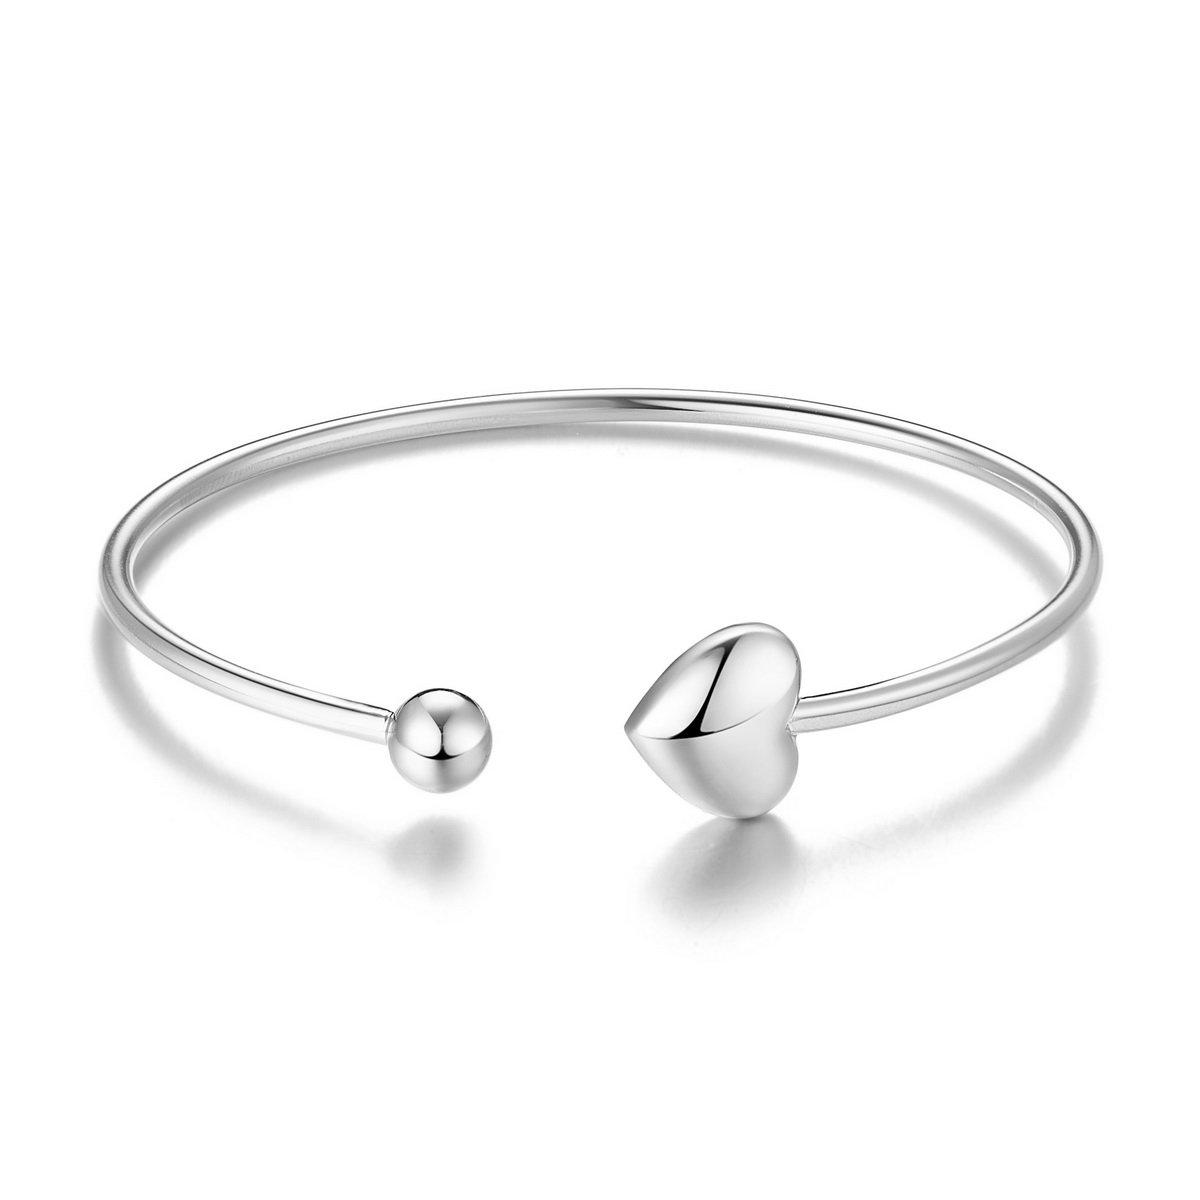 SHEGRACE Heart Charm Bracelet Bangle, 925 Sterling Silver Cuff Bangle, Heart and Bead, Platinum, 55mm